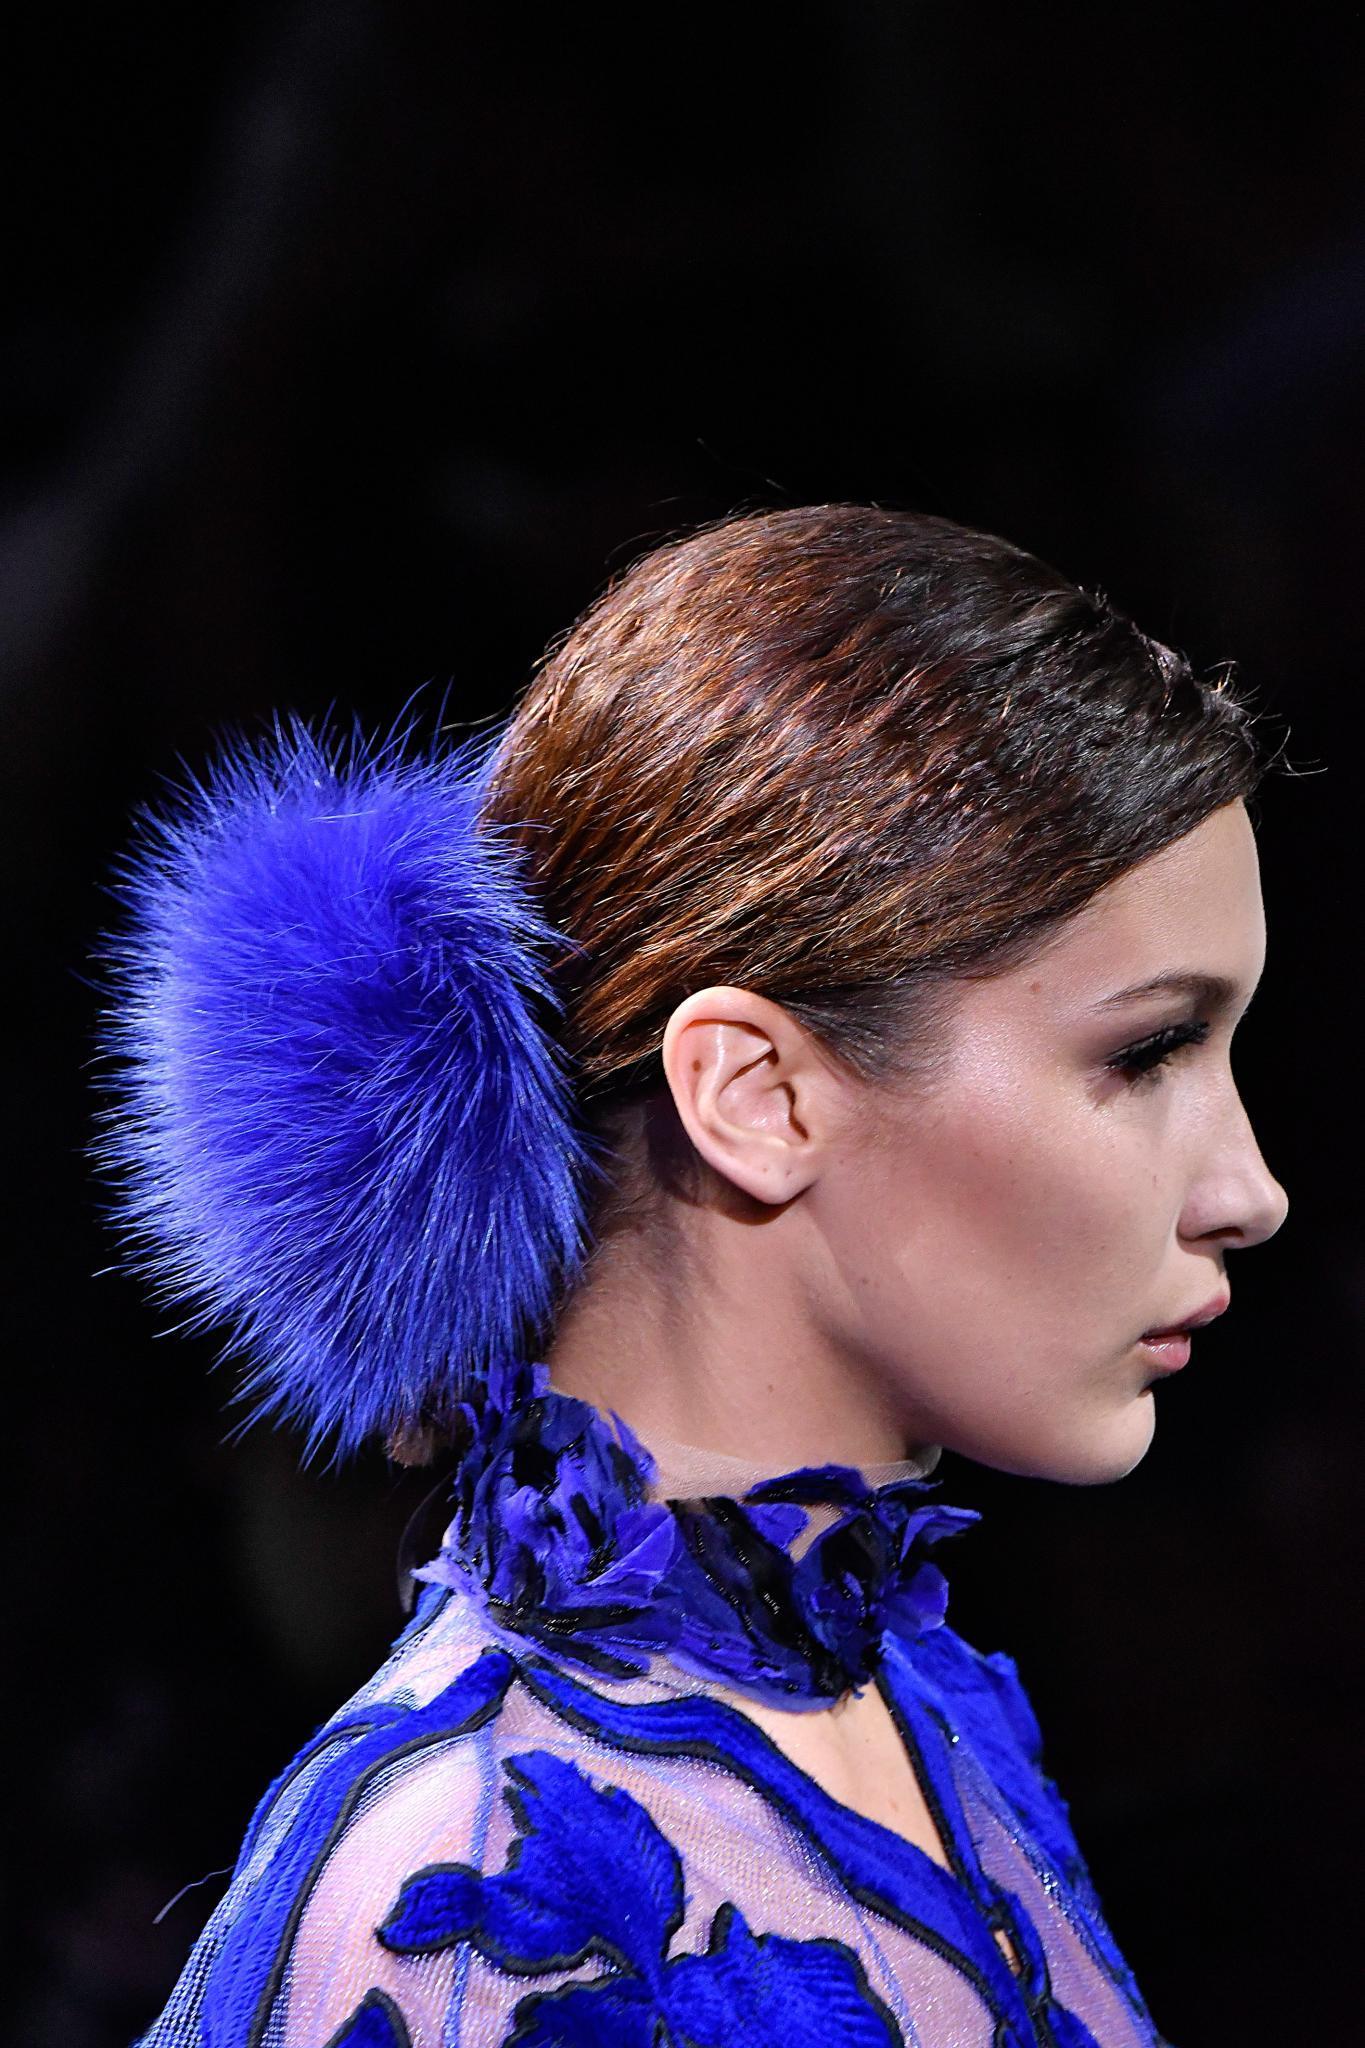 Toma de perfil, de mujer con cabello recogido con un gran pompón azul